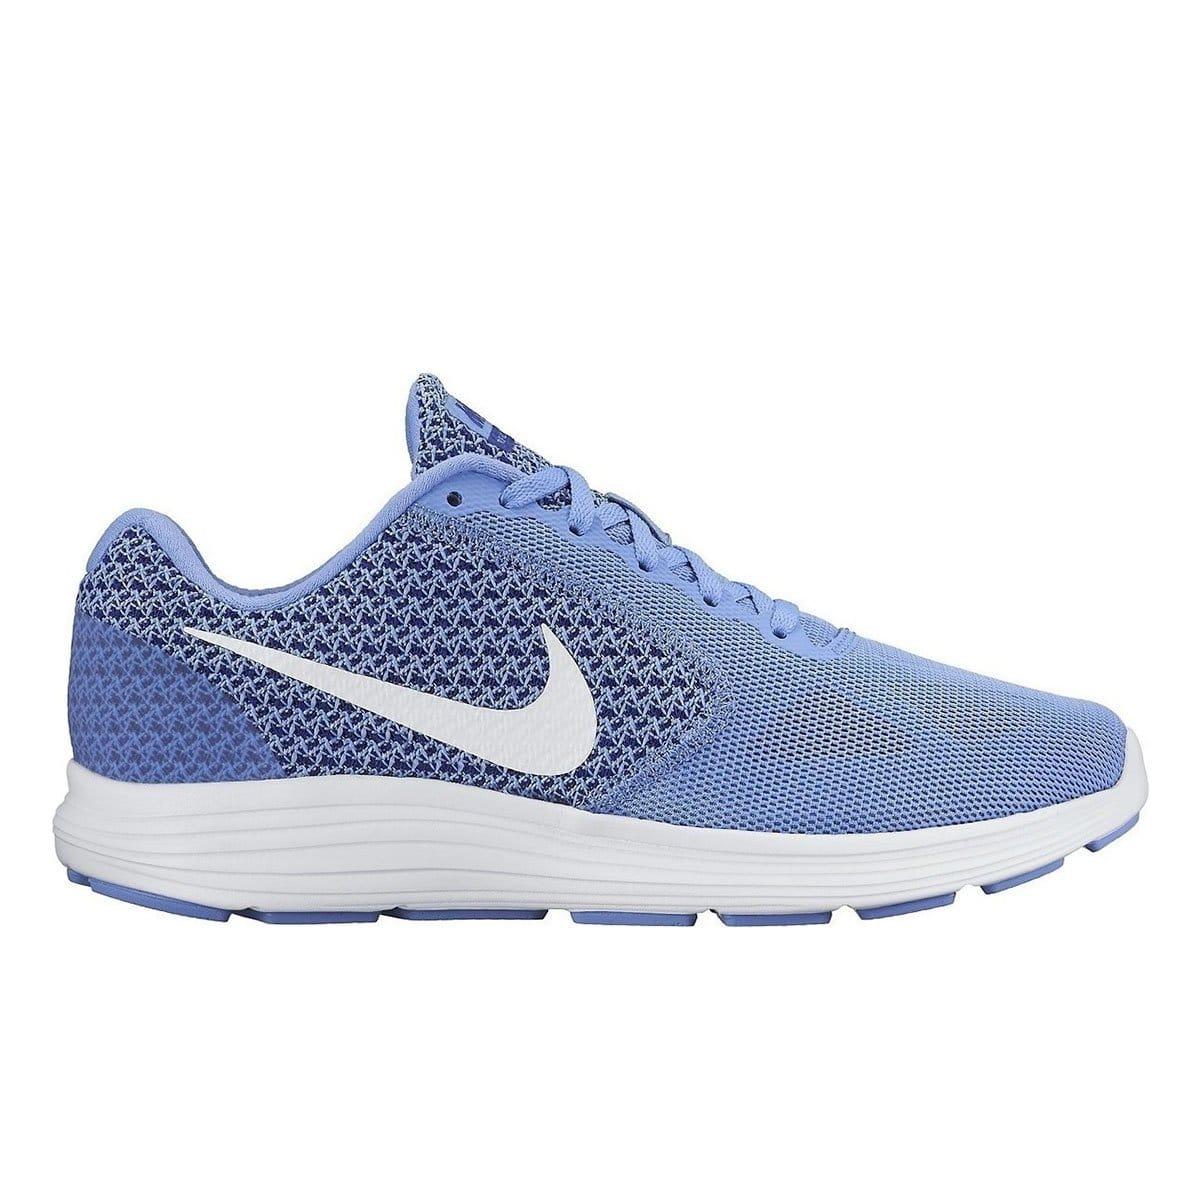 79842b2755520 Scarpa Nike Revolution 3 Donna 819303- 400